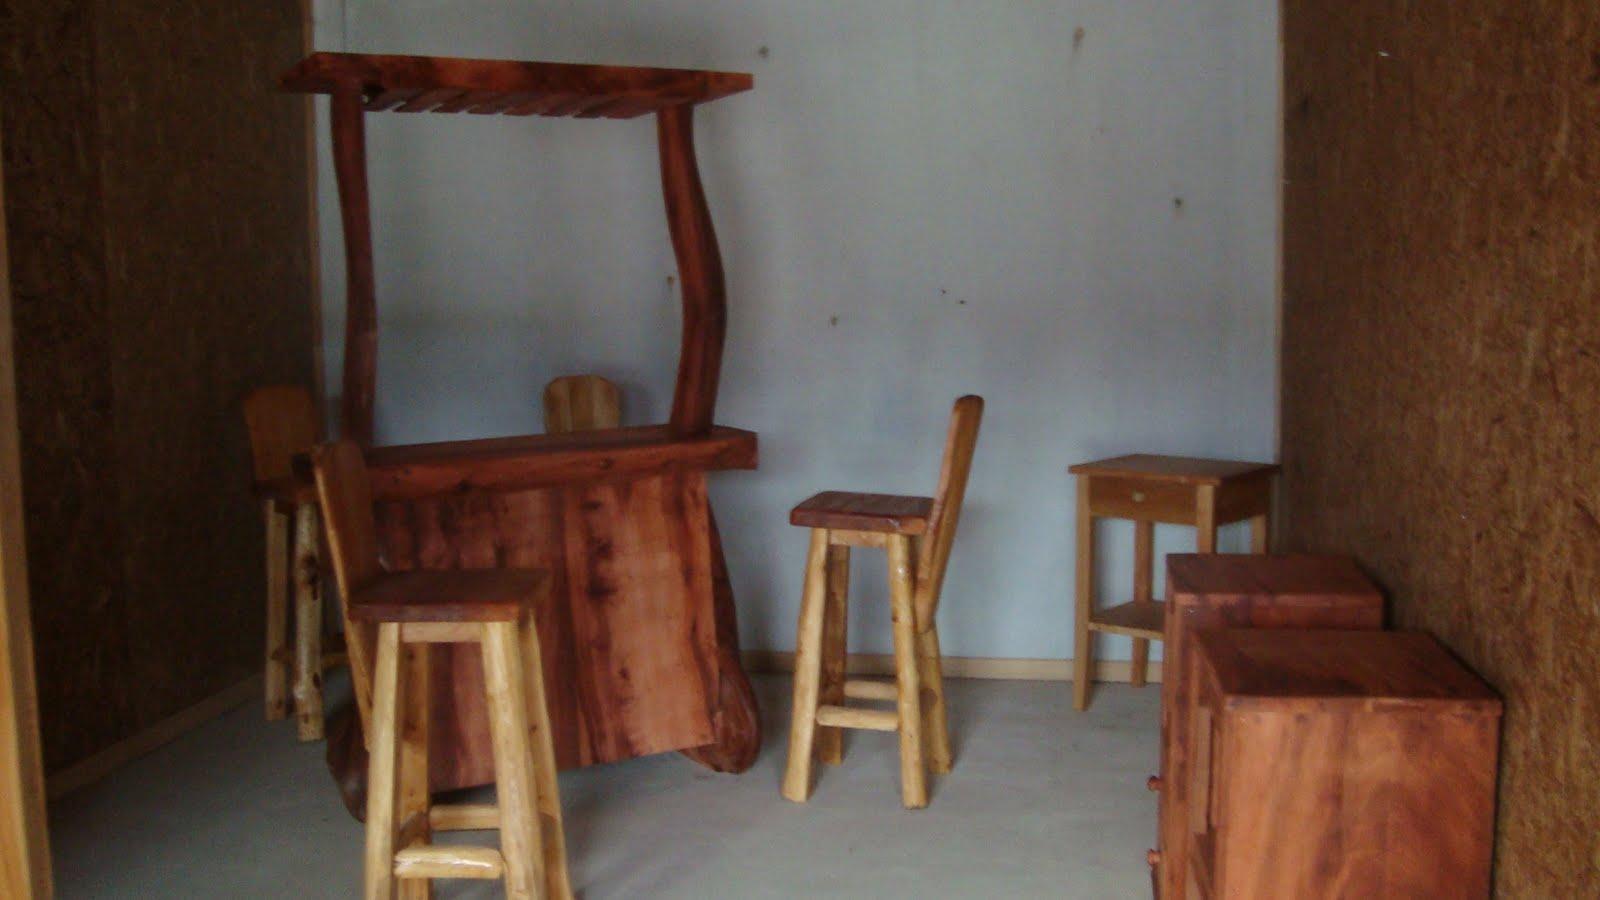 Artesanos de alerce historico for Muebles artesania